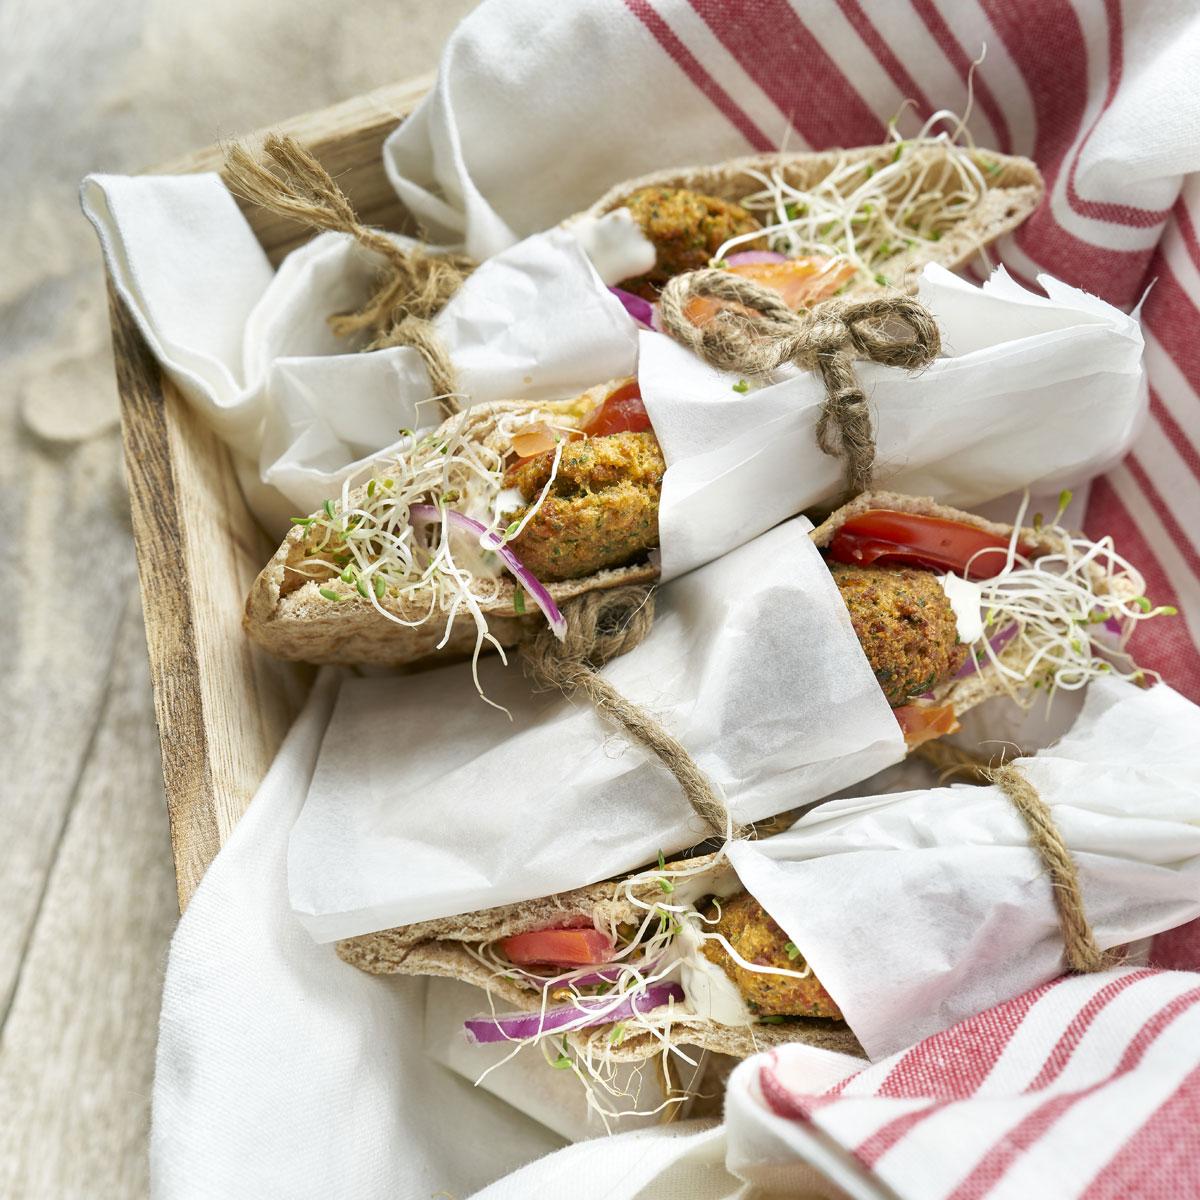 Pitas de falafel